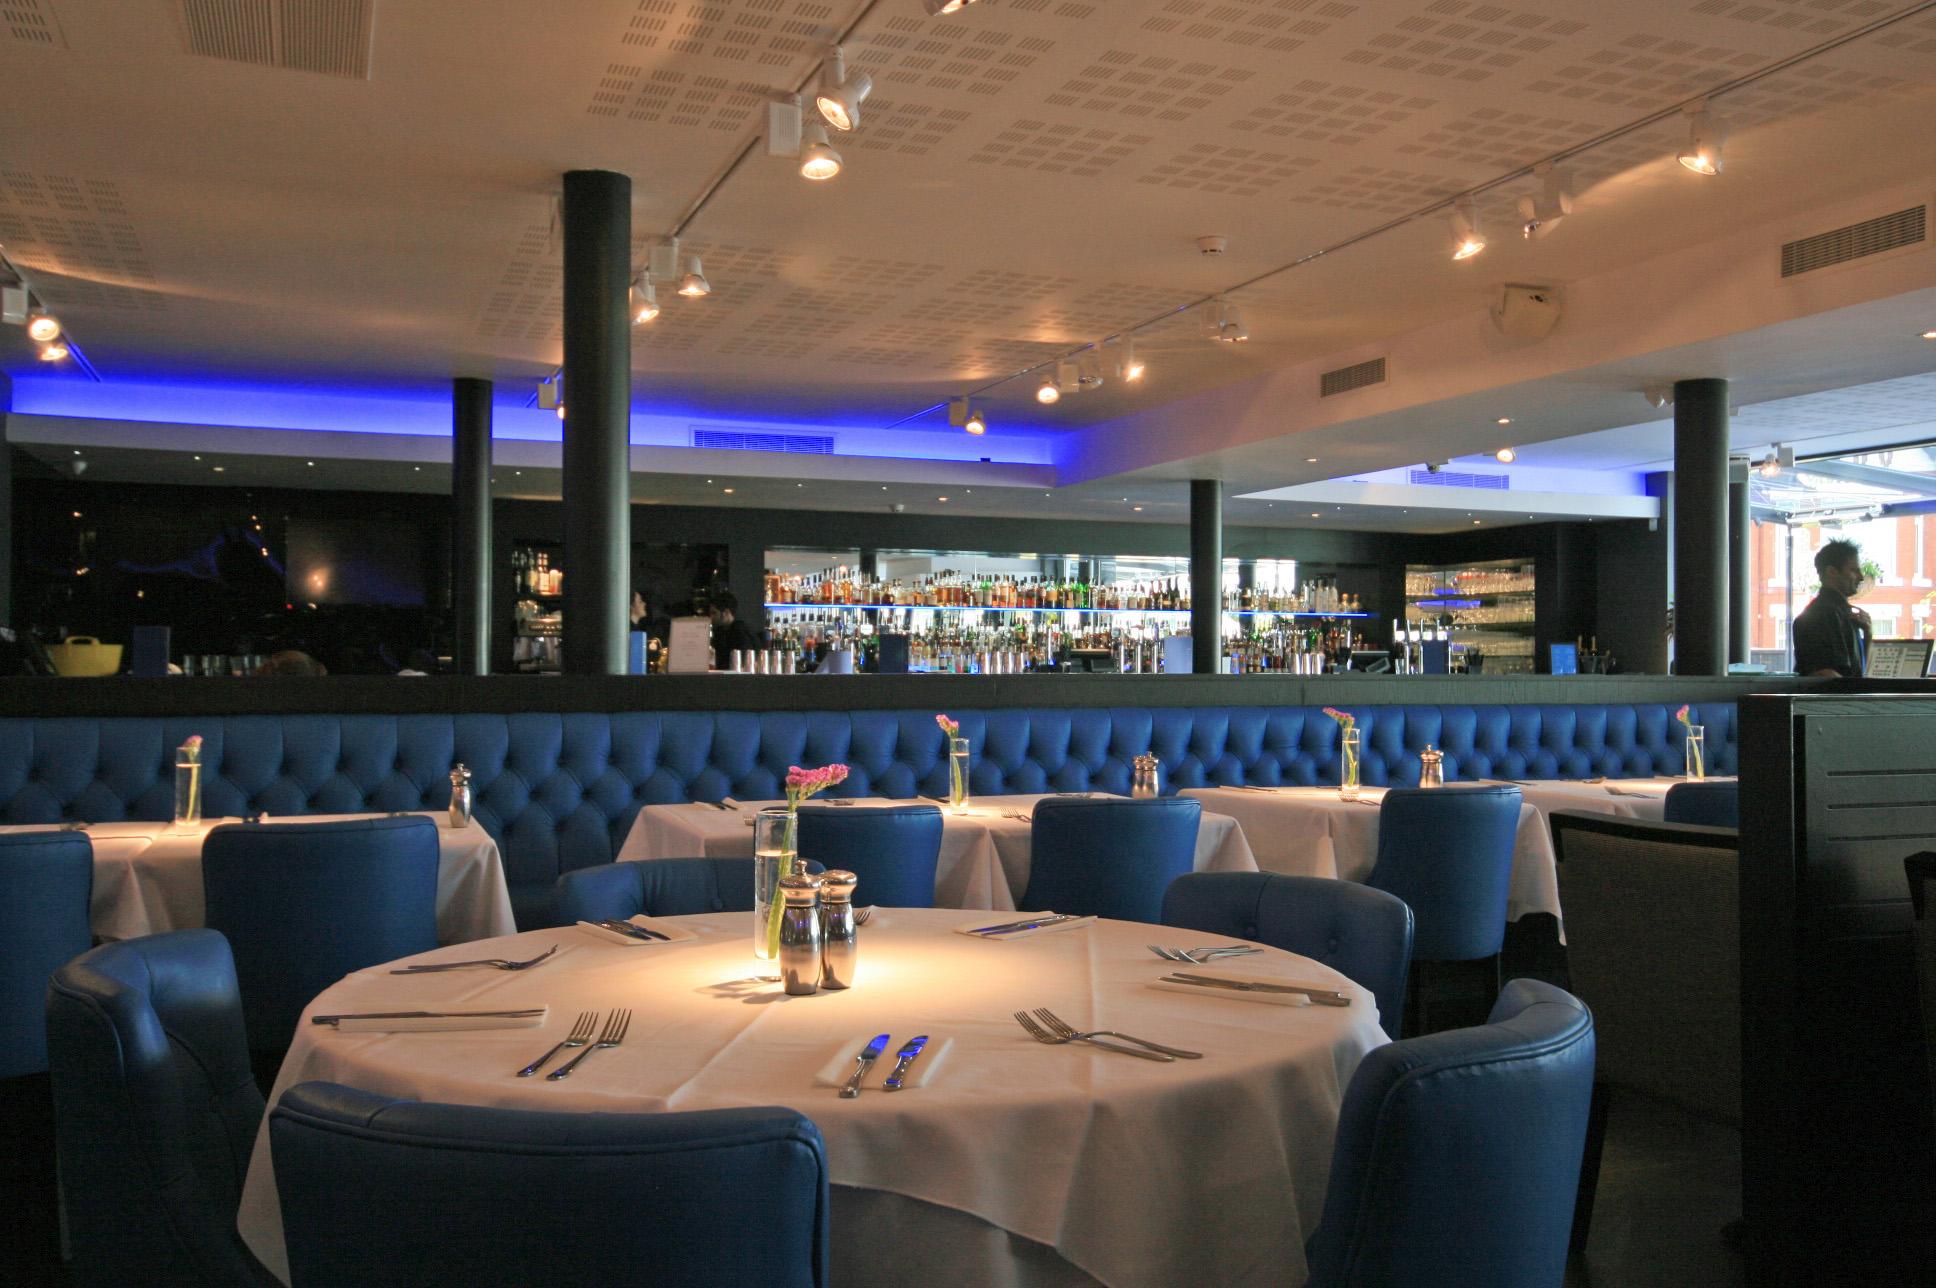 Albert's Restaurant and Bar Worsley - Interior